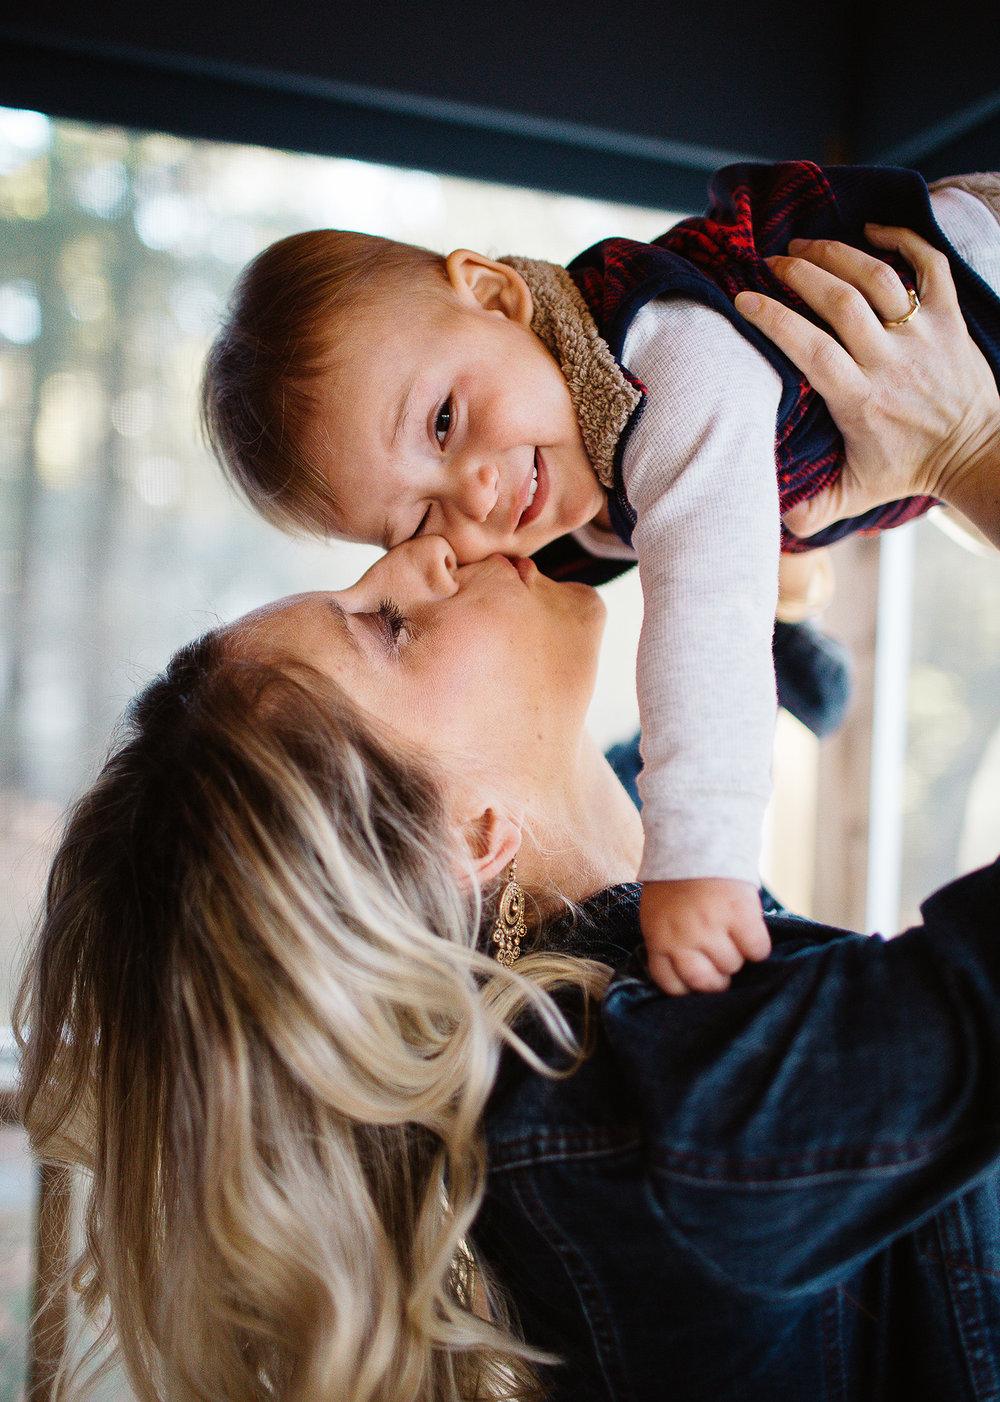 Greater Boston family photographer Joy Uyeno Sudbury mother and baby kiss